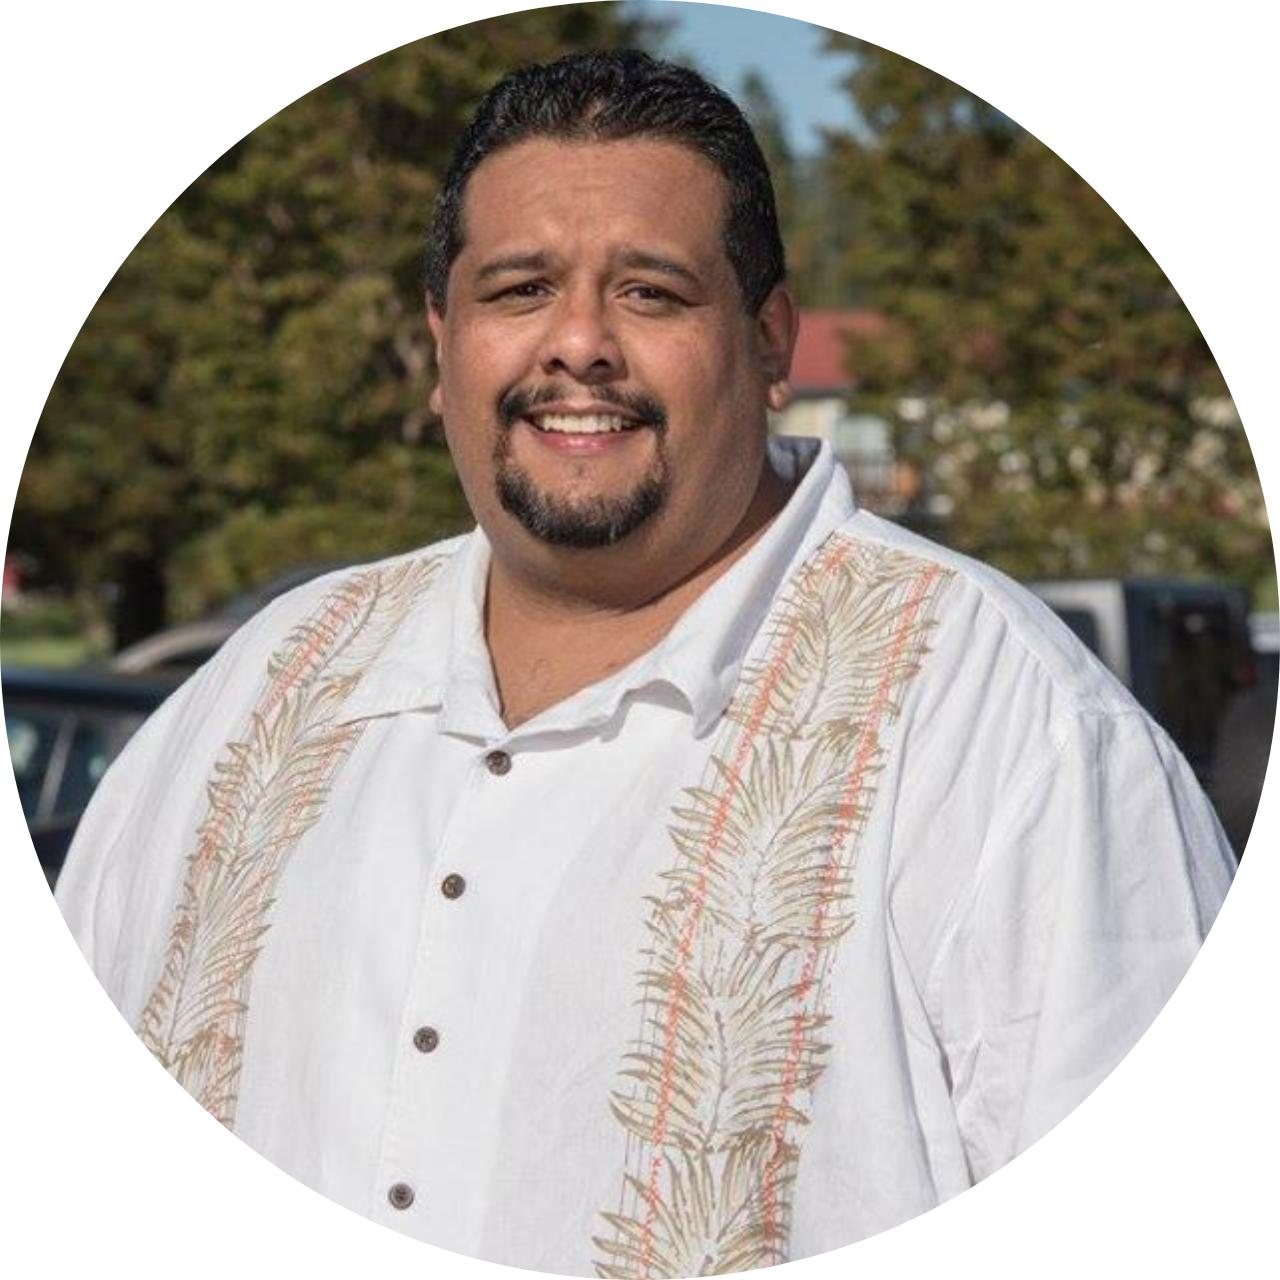 Omar Medina, Where Are They Now